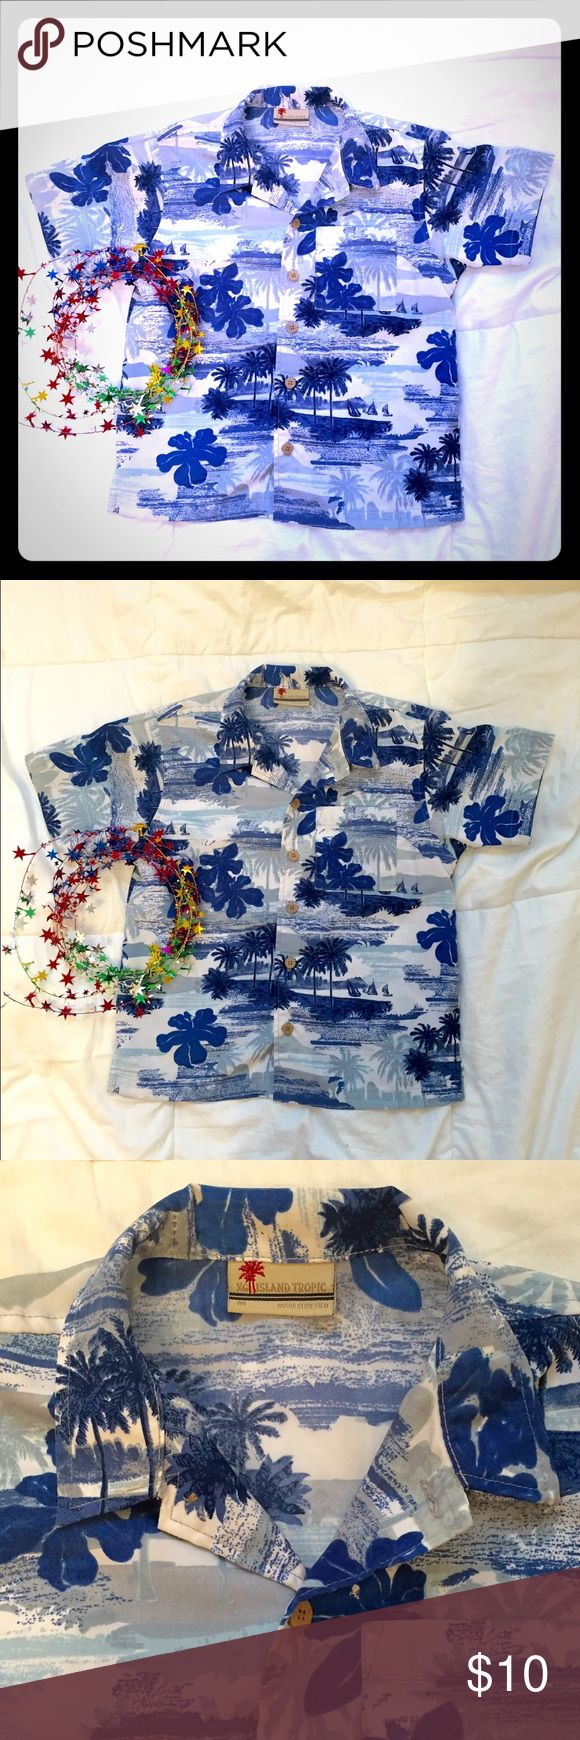 BOGO 50% off Boys Hawaiian Shirt Super cute Boys Hawaiian Shirt   Size Medium. I believe its a size 6/7. This is based on when my son wore it.  Great fir Hawaiian themed parties or a fun dress shirt.  Collared button down shirt. Shirts & Tops Button Down Shirts